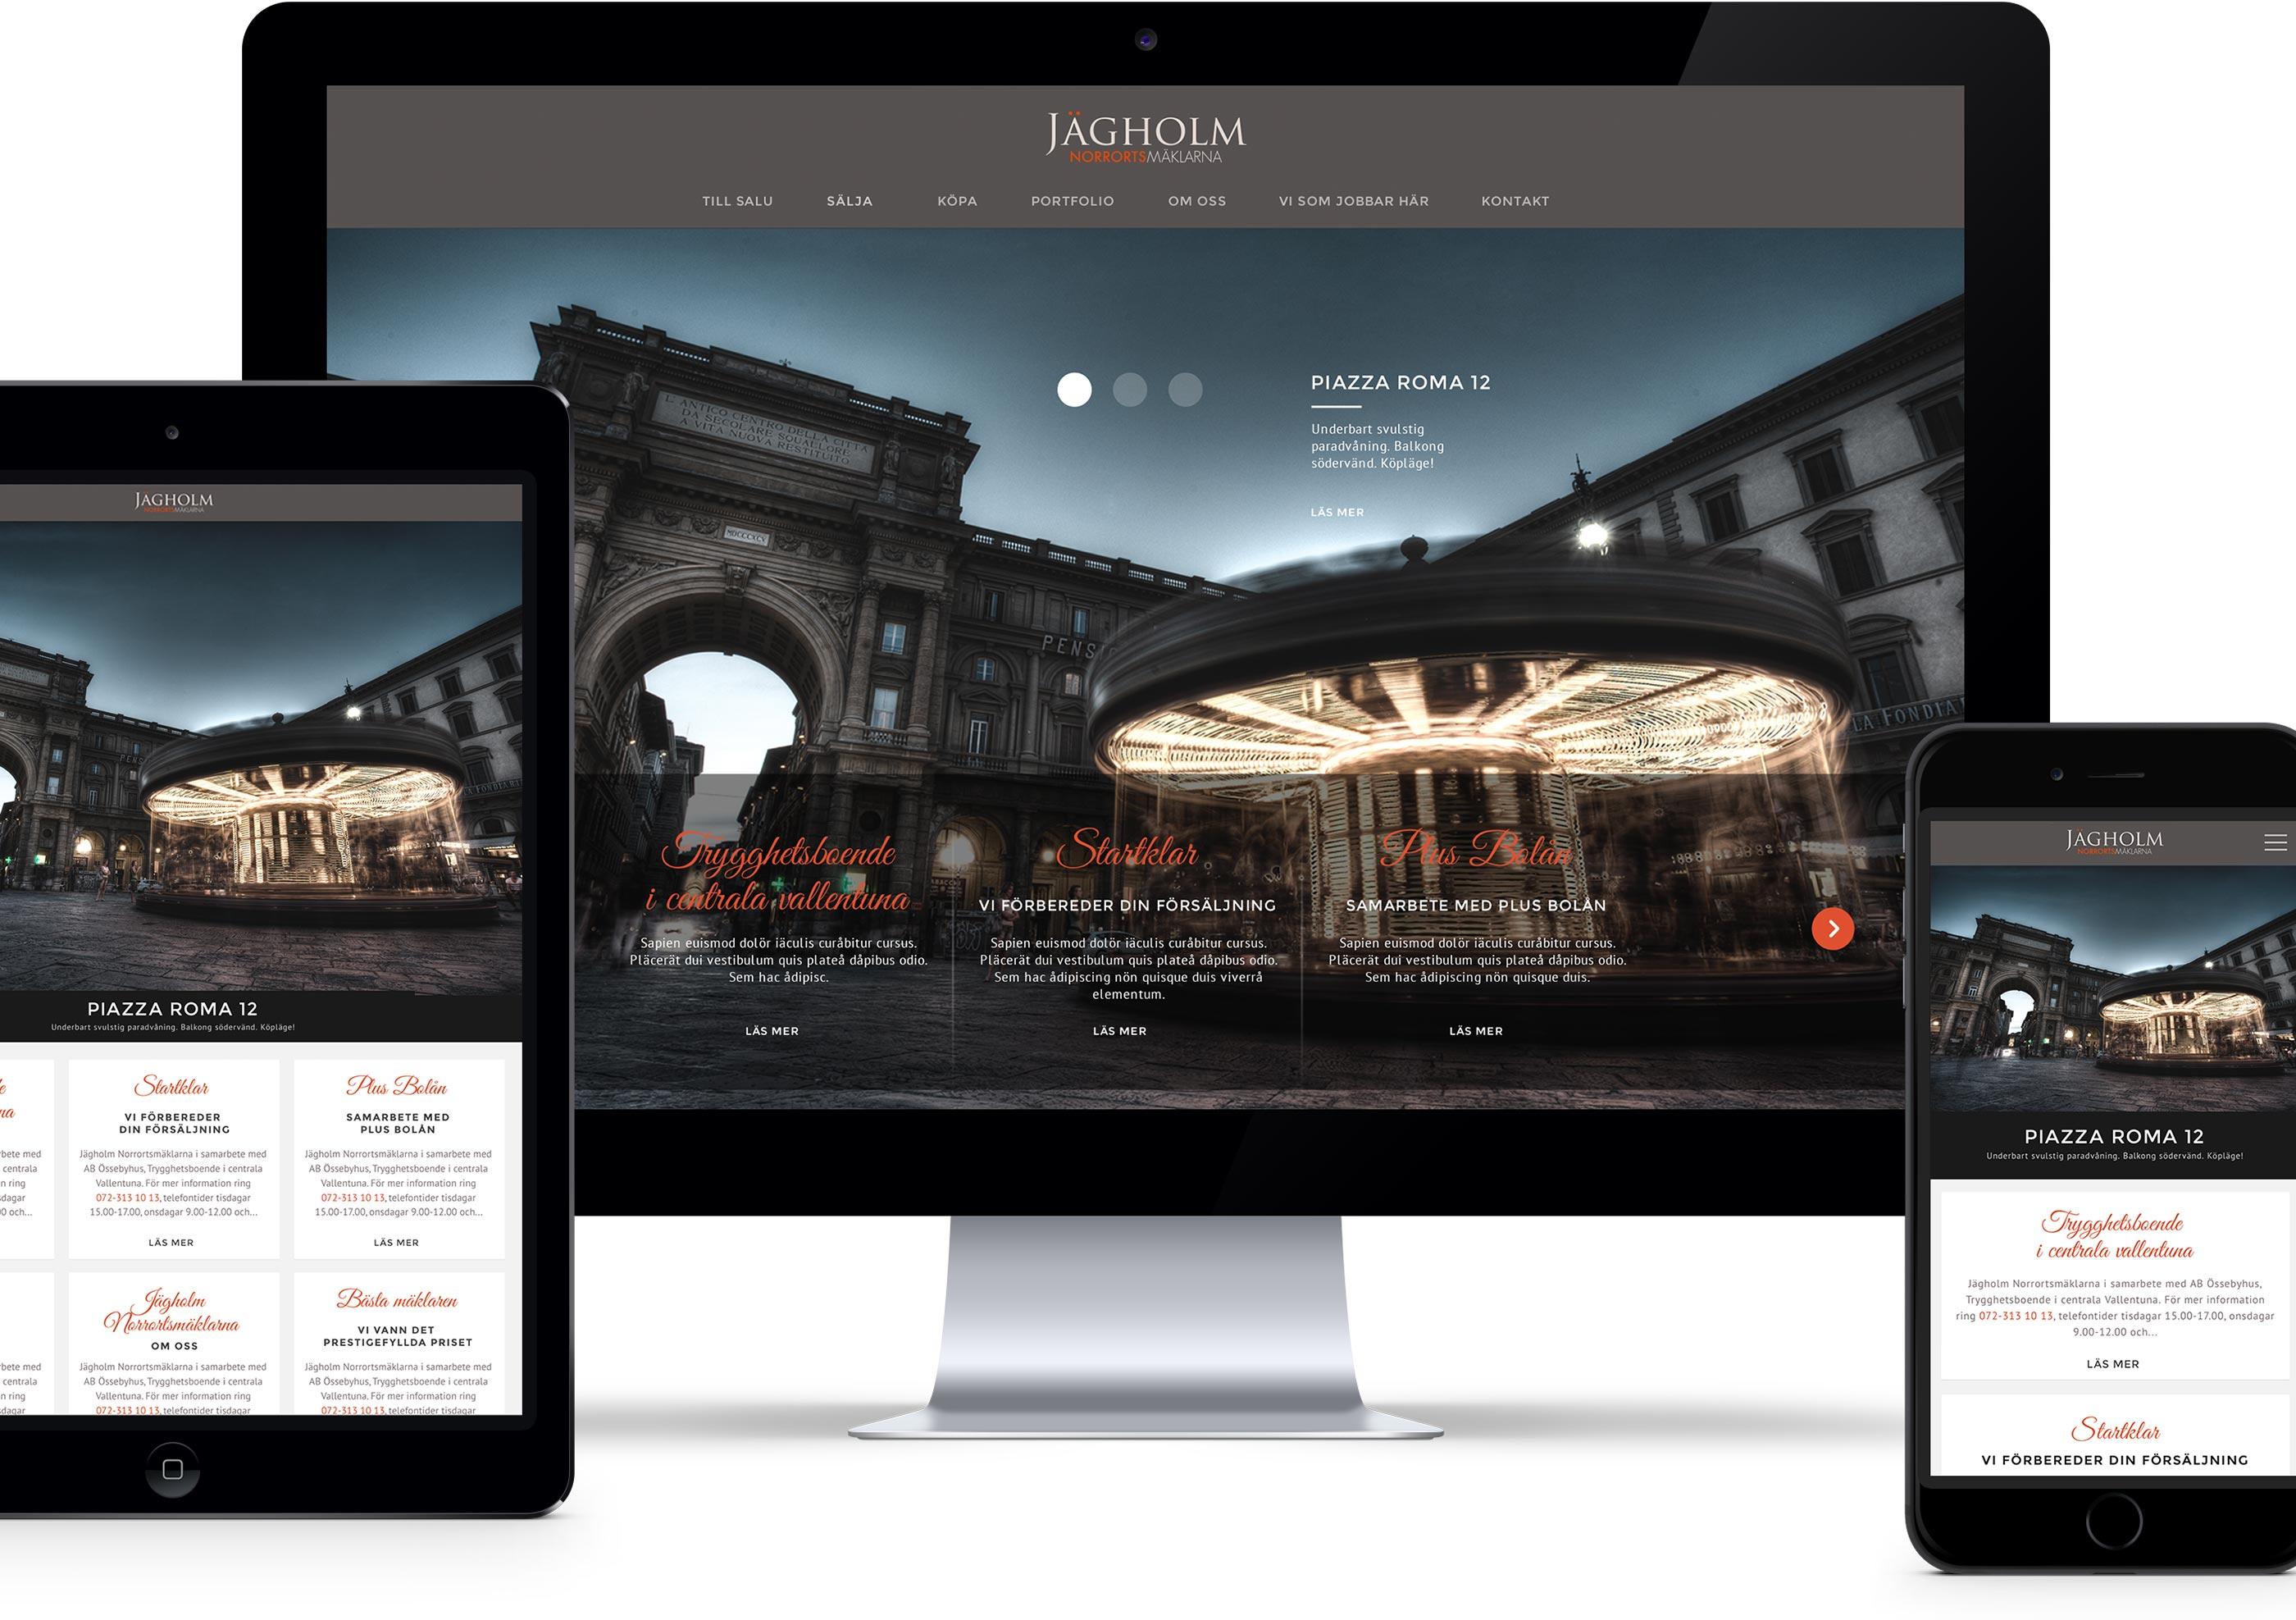 Jägholm website on different devices